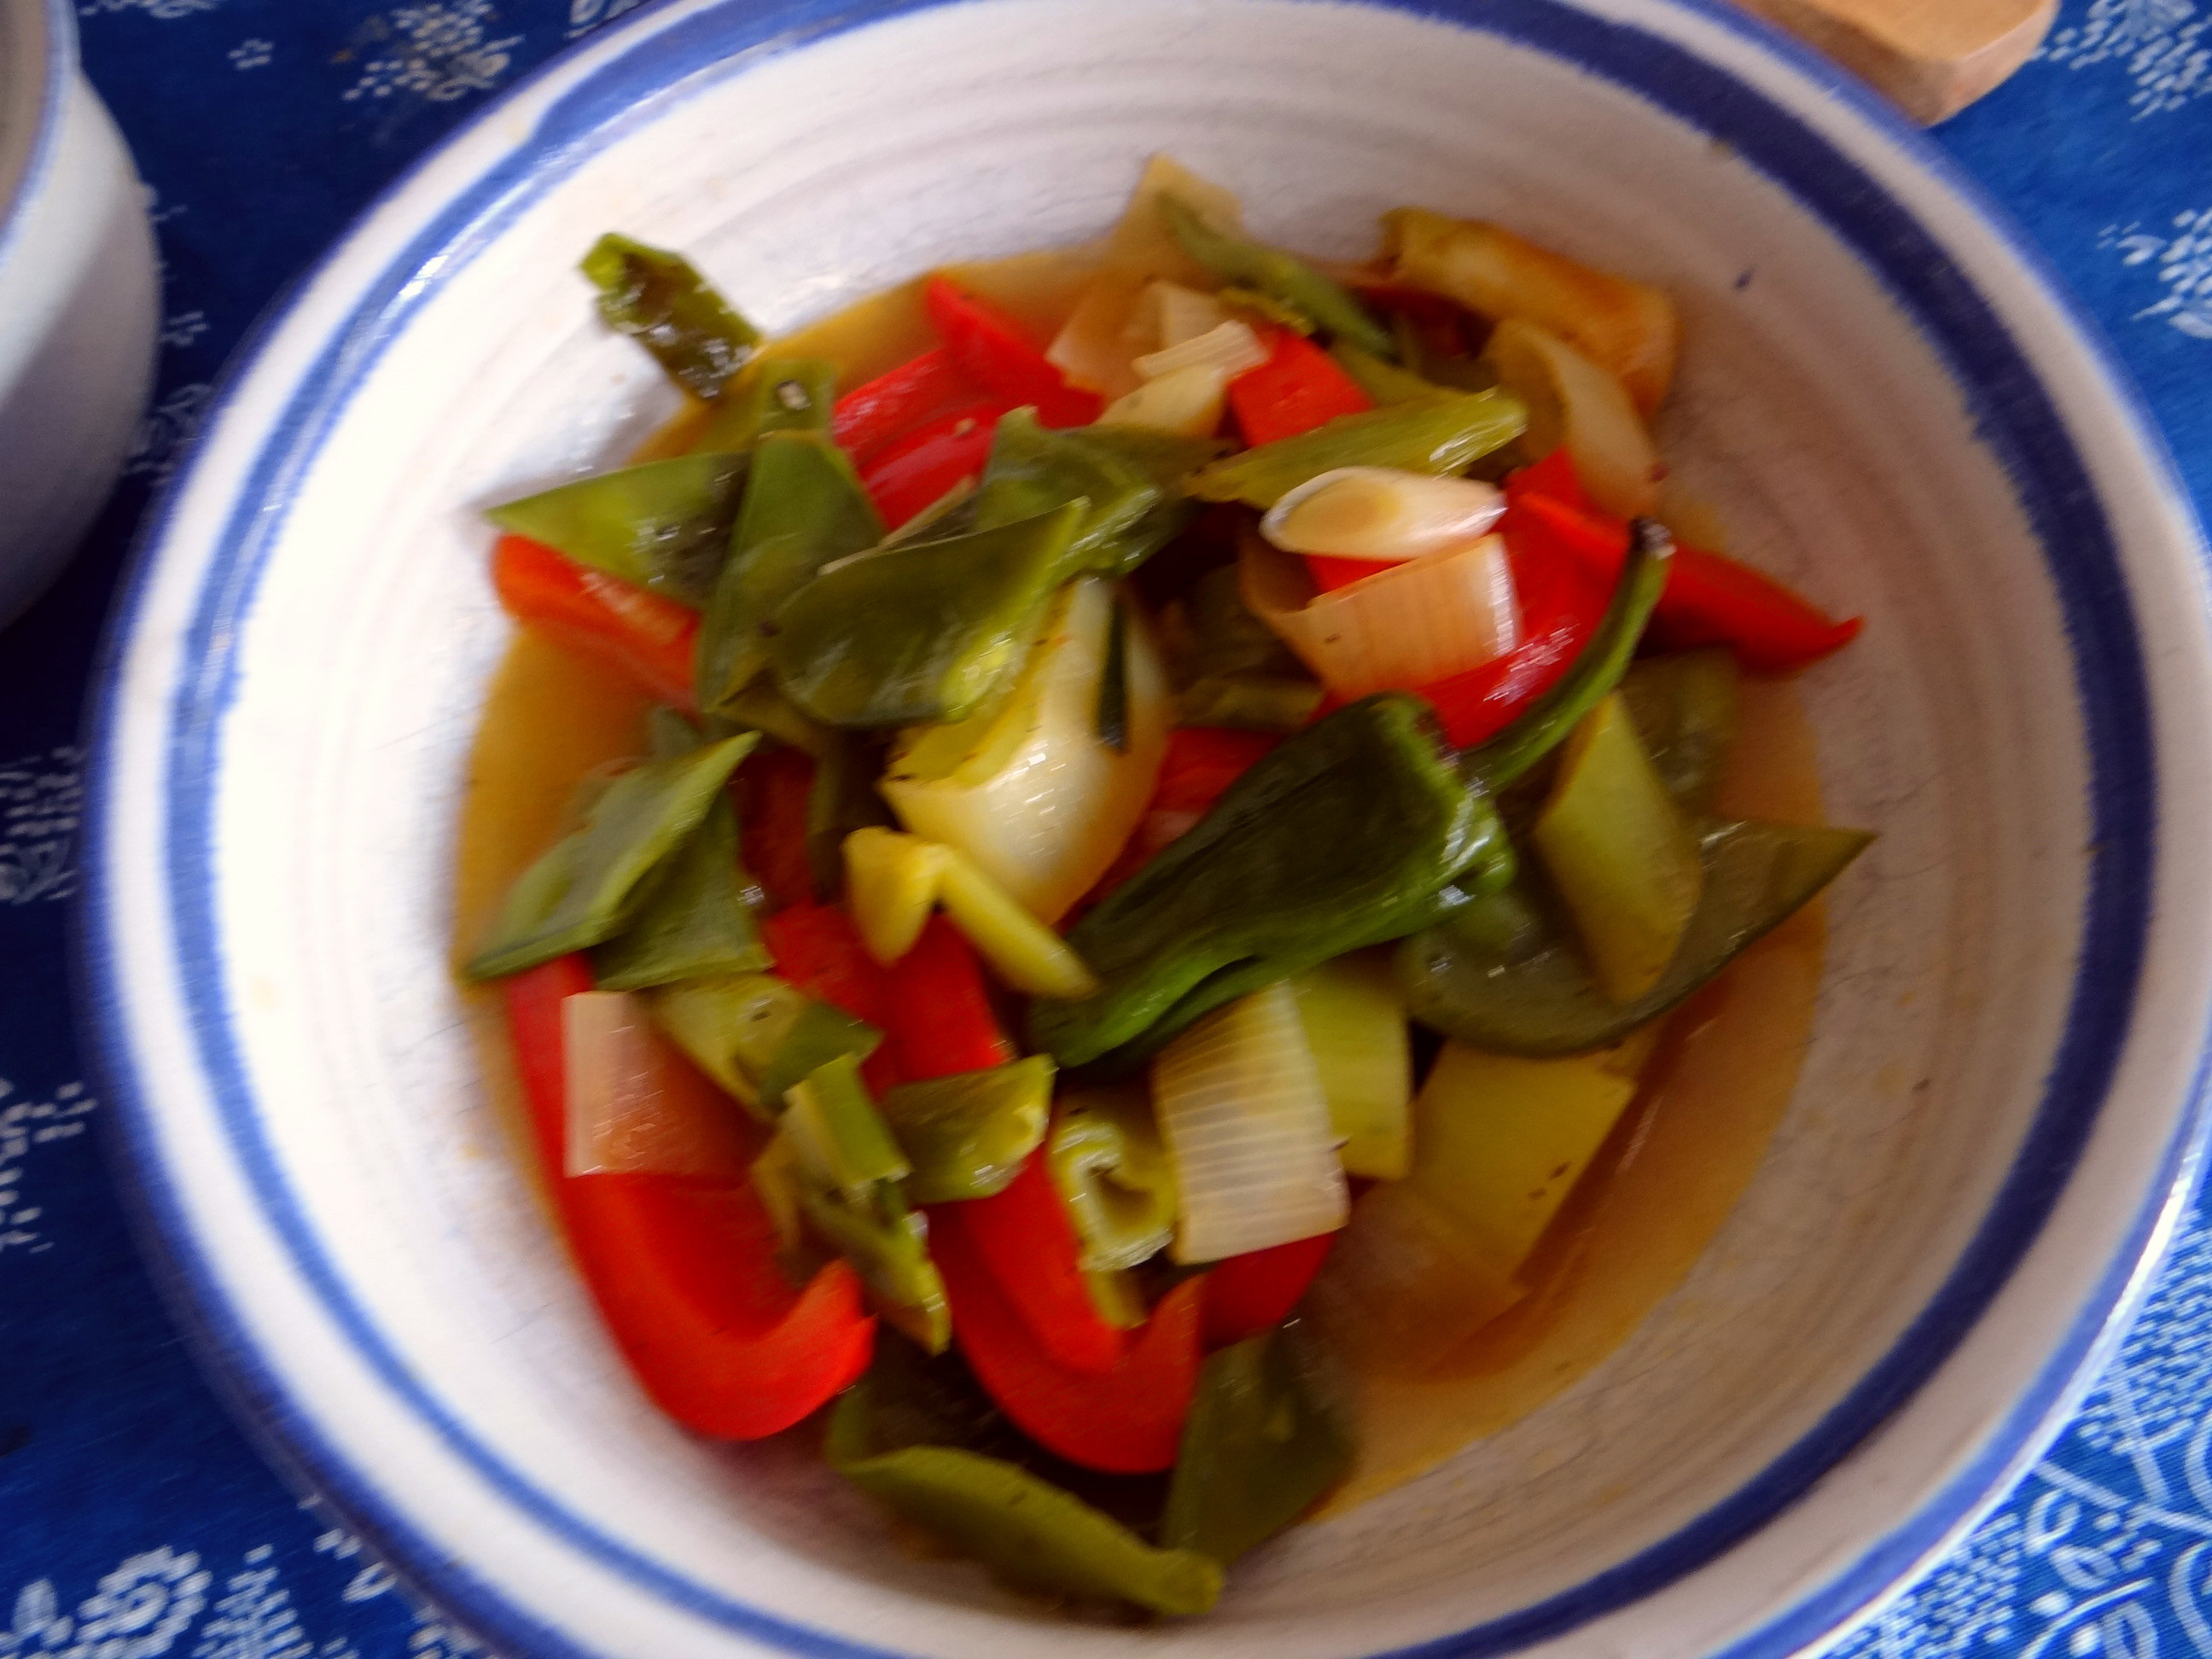 Bouillionkartoffeln, Feldsalat, Zwiebelringe, Kleines Gemüse (8)